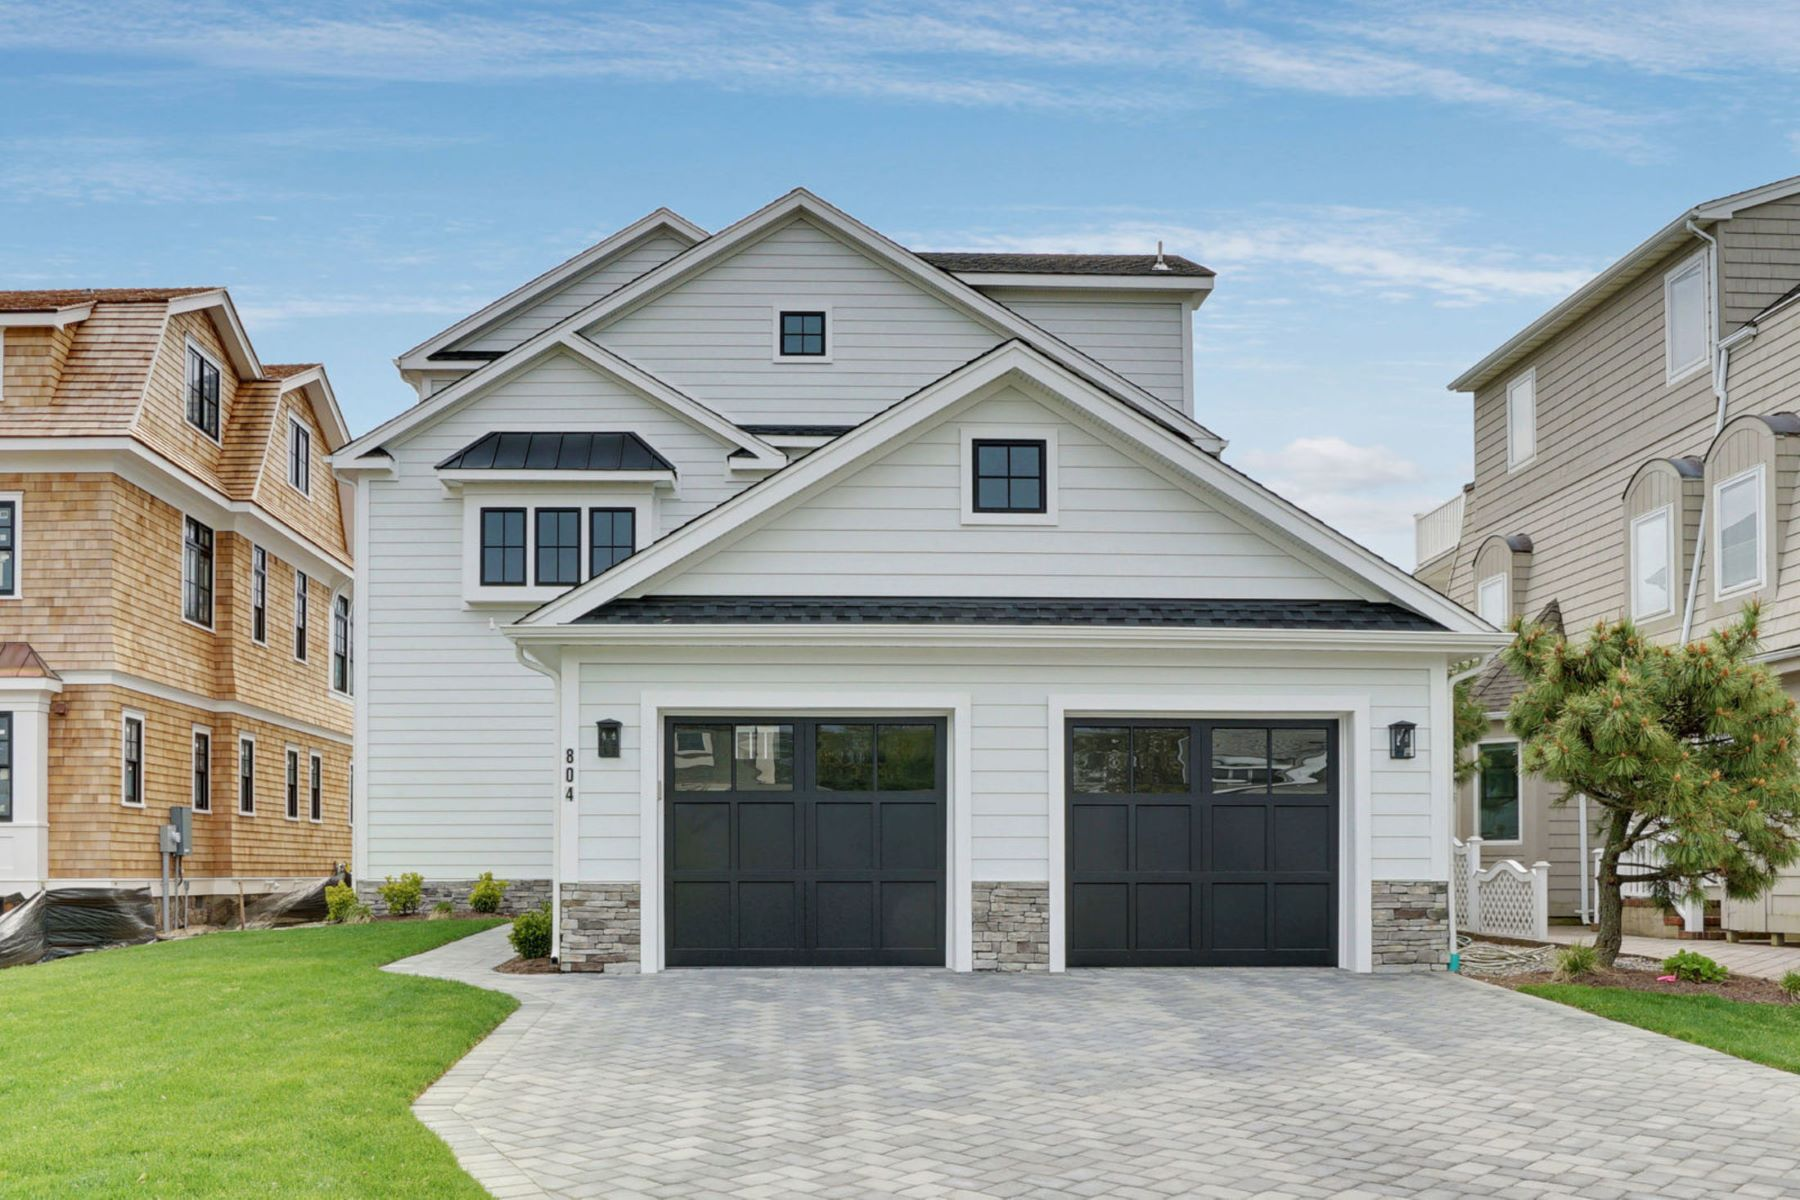 single family homes для того Продажа на Seaside Escape 804 First Avenue, Sea Girt, Нью-Джерси 08750 Соединенные Штаты